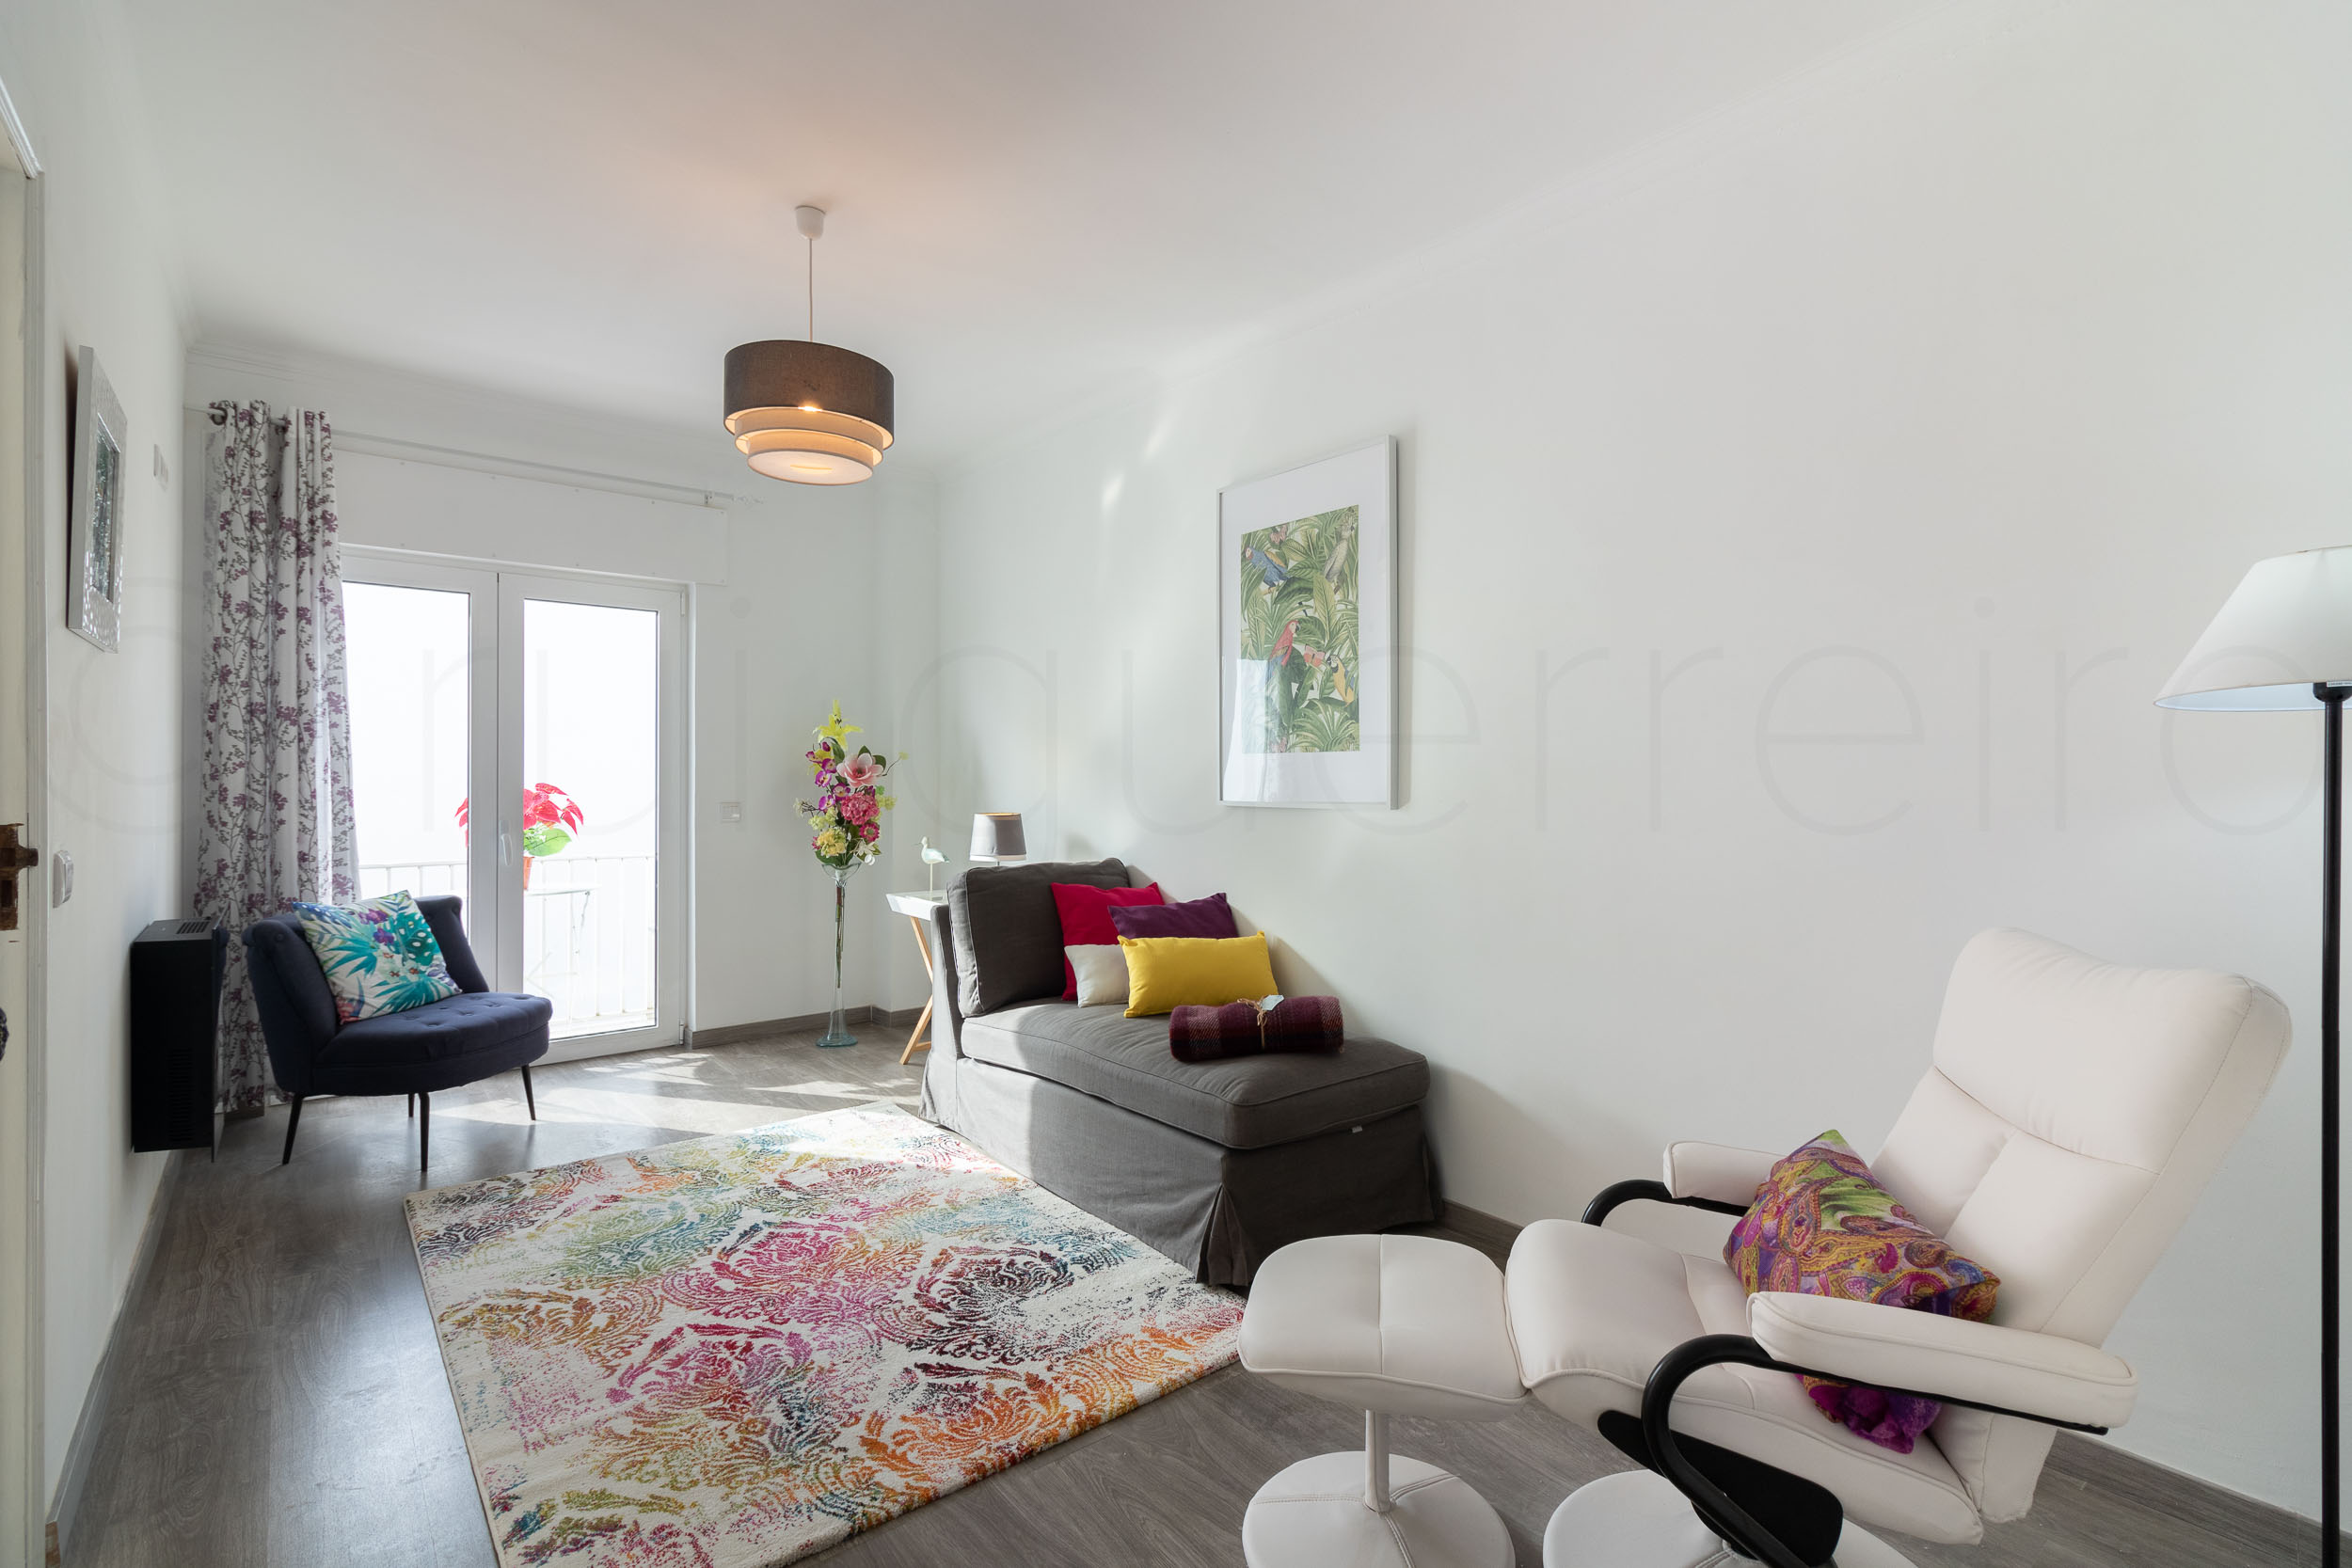 rui-guerreiro_apartamento-apartment-olhao_20180420_0001.jpg